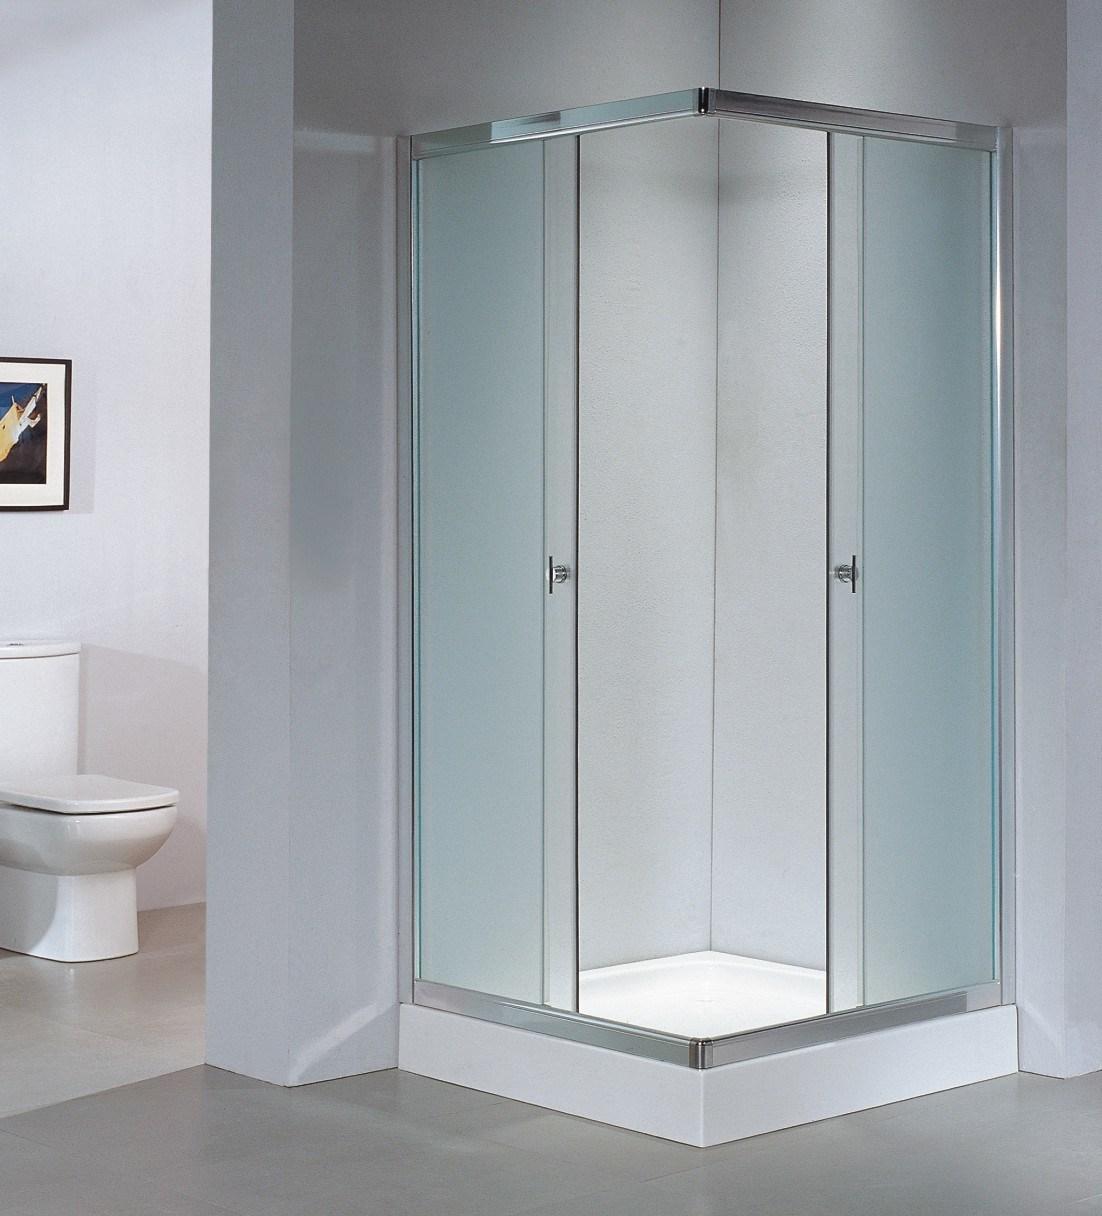 China Shower Box (sltjf80w)  China Shower Box, Glass